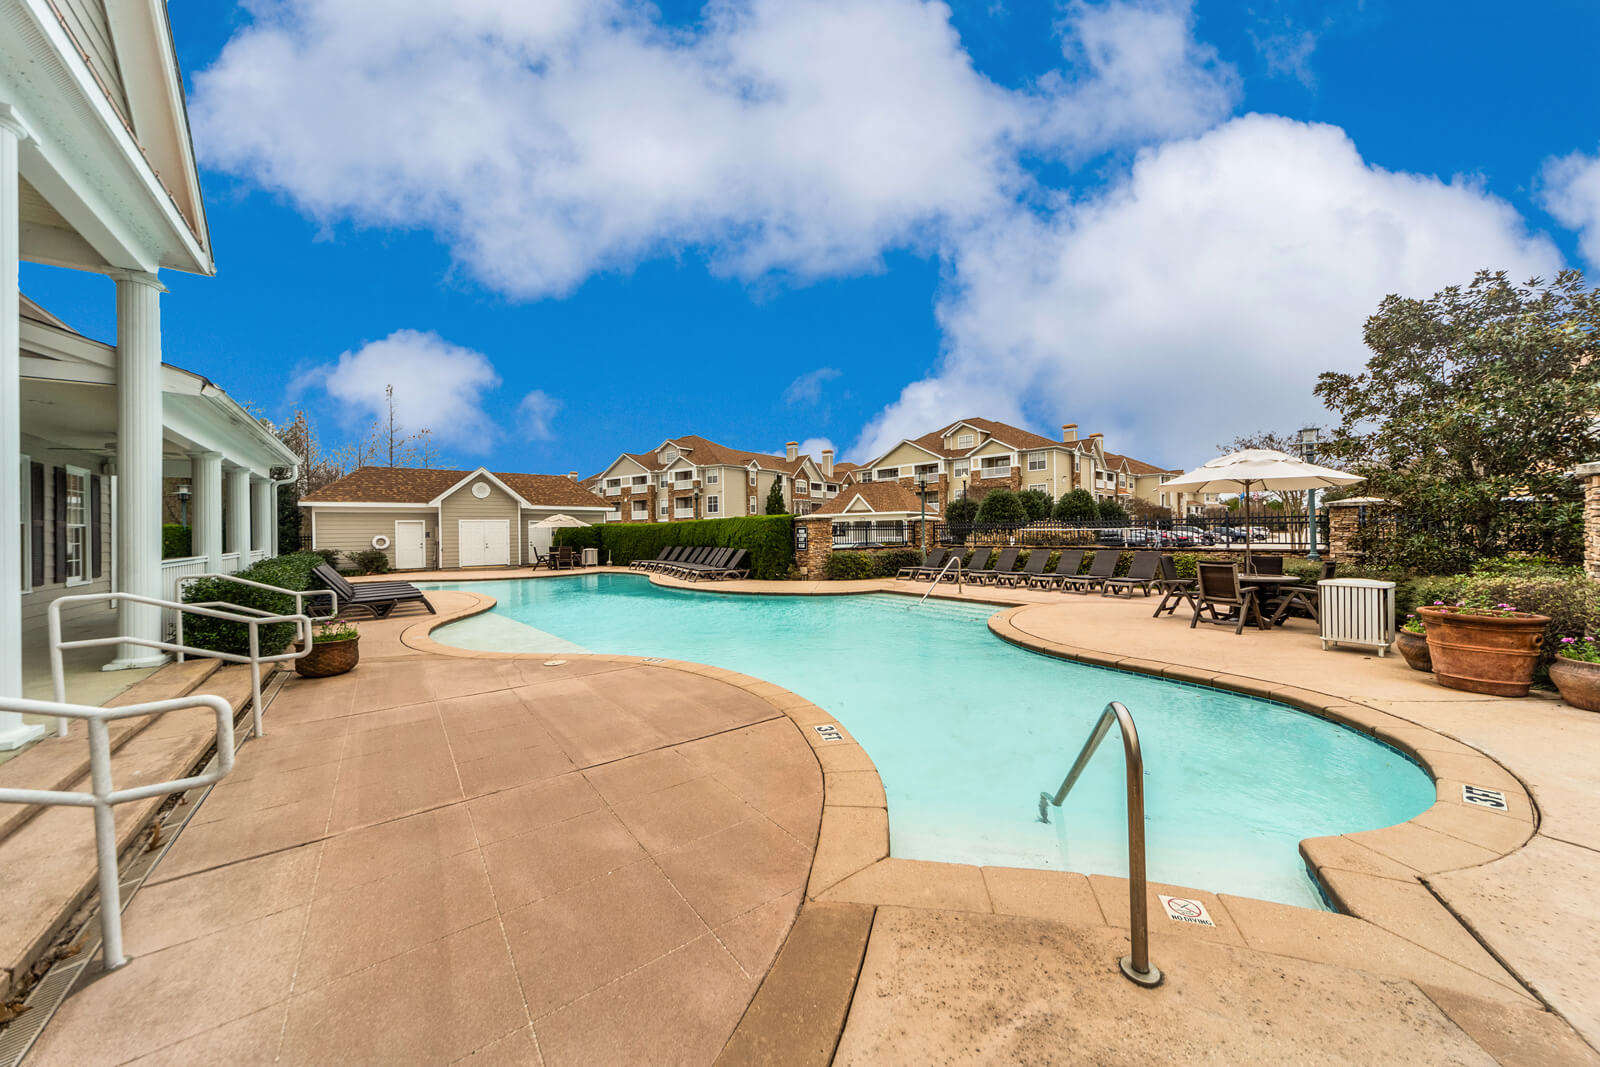 The Regent Resort Style Pool